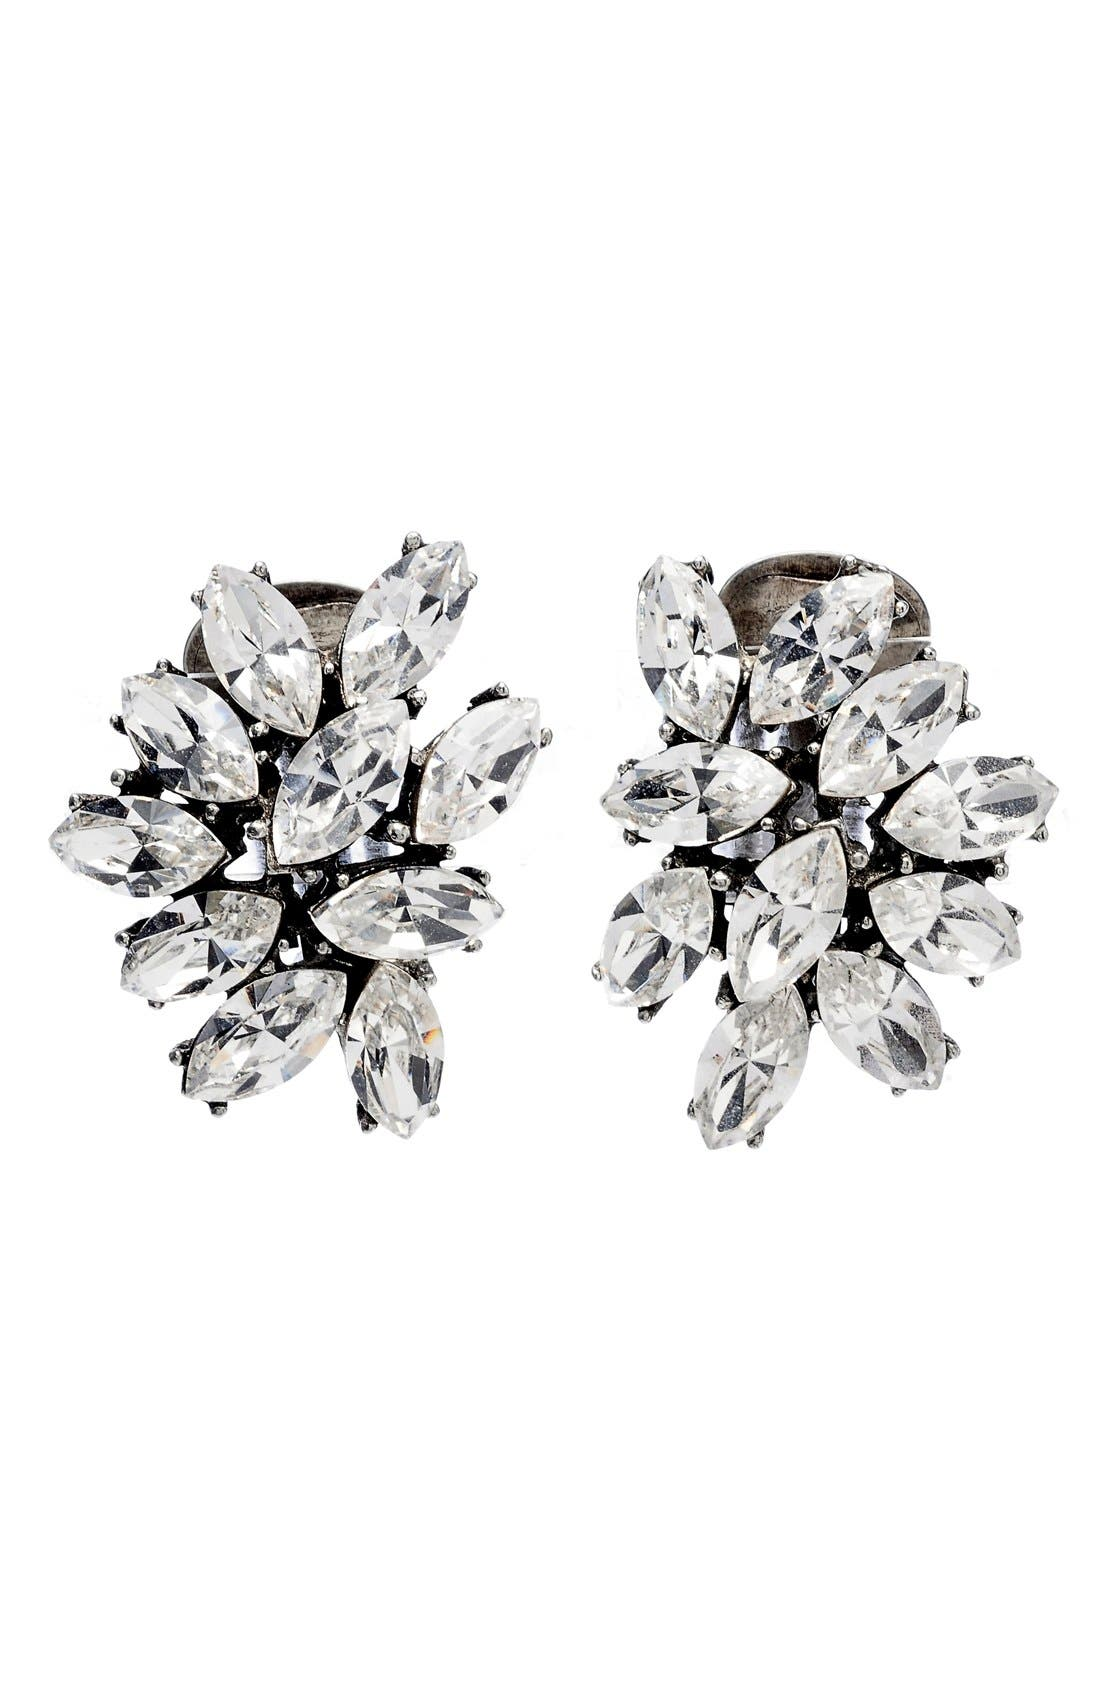 Alternate Image 1 Selected - Ben-Amun Swarovski Crystal Cluster Clip Earrings